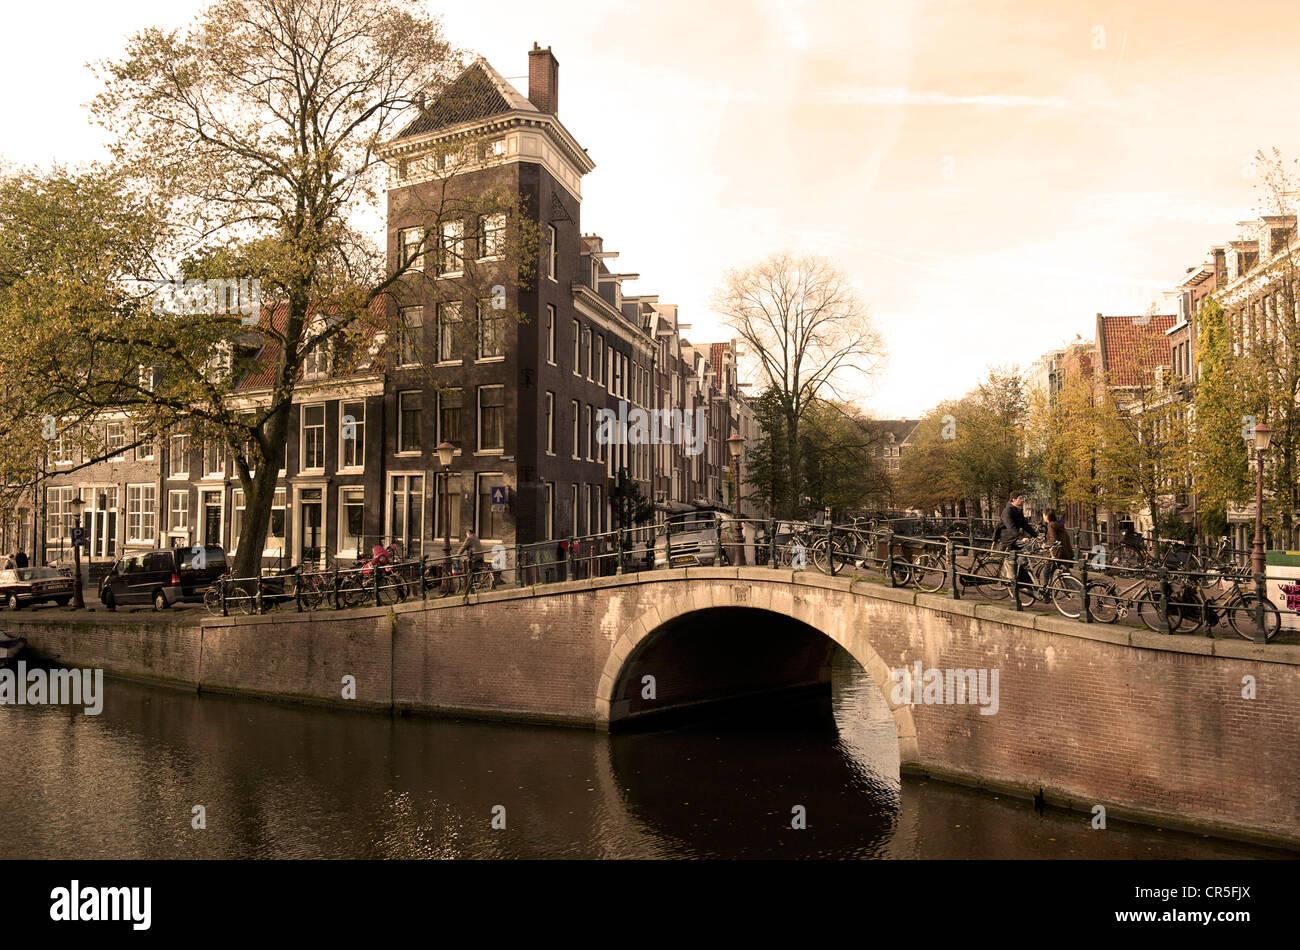 Netherlands, Amsterdam, bridge over Prinsengracht canal - Stock Image